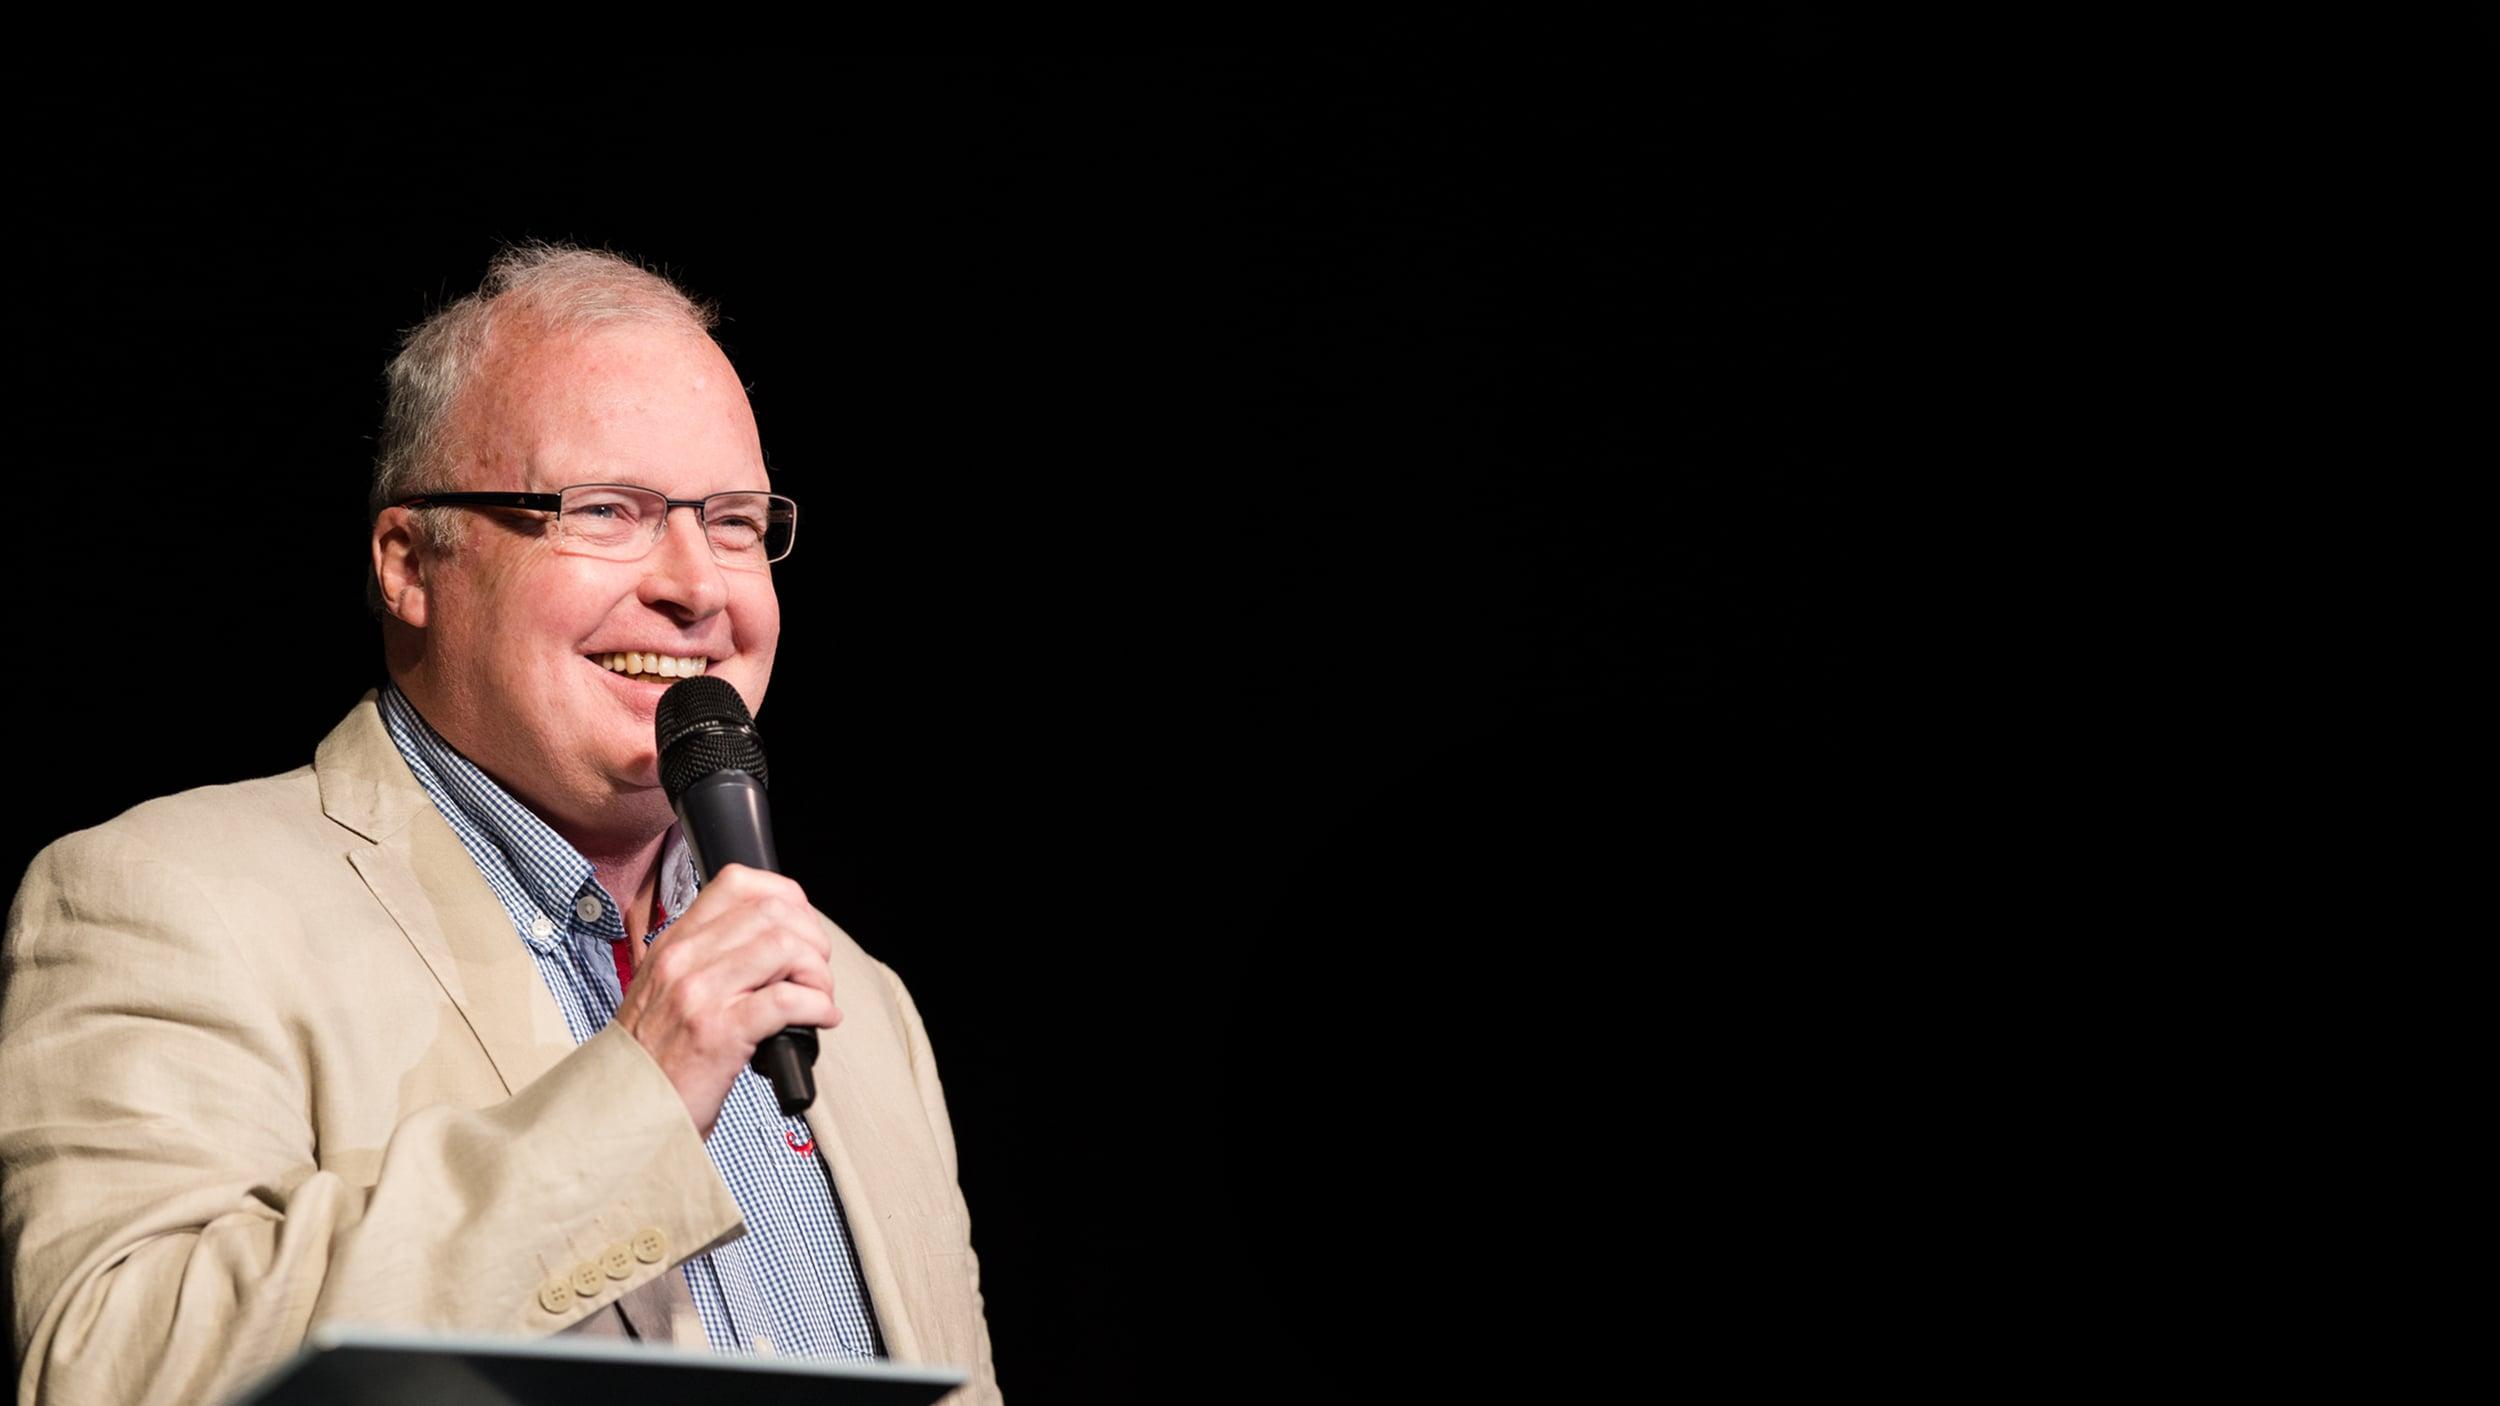 Pastor Wes Richards